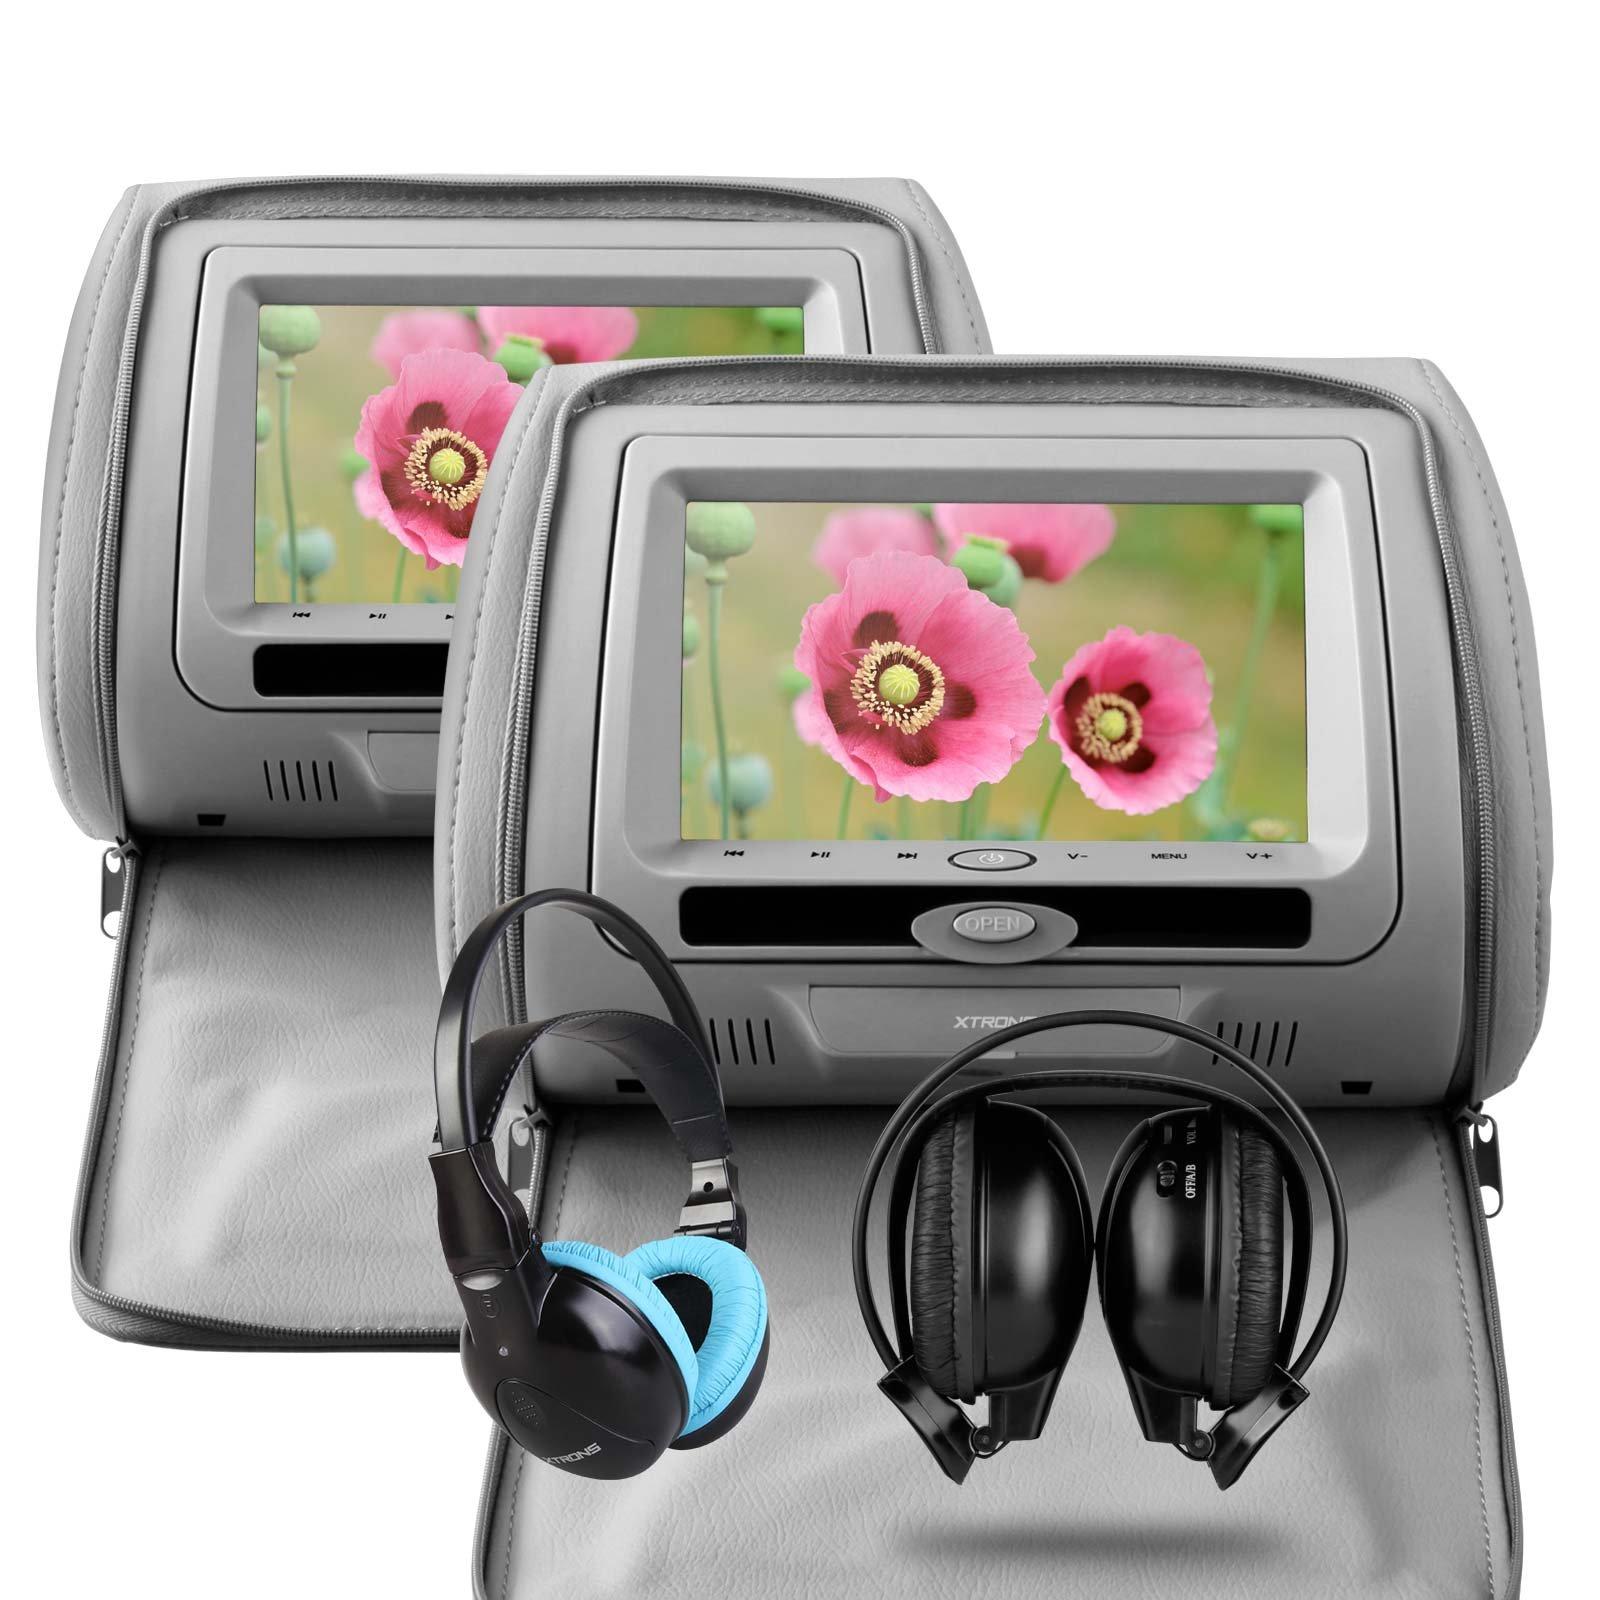 XTRONS® Grey 2X Twin Car Headrest dvd player with Multi-Media USB SD Slot 7'' HD Screen Game Disc IR Headphones